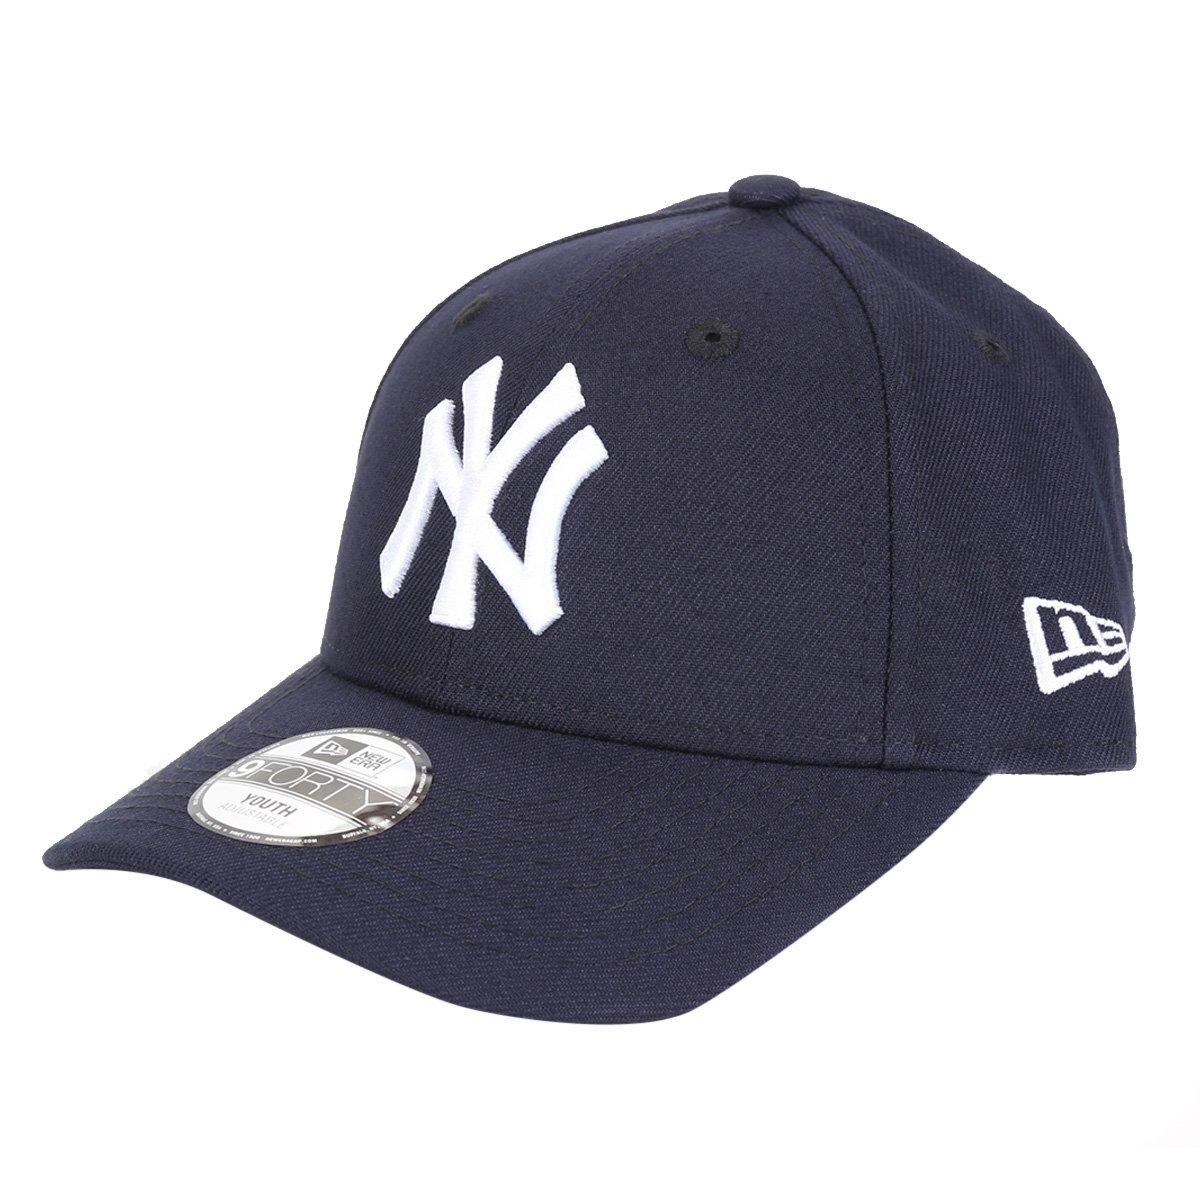 Boné Infantil New Era MBL New York Yankees Aba Curva Strapback 9Forty